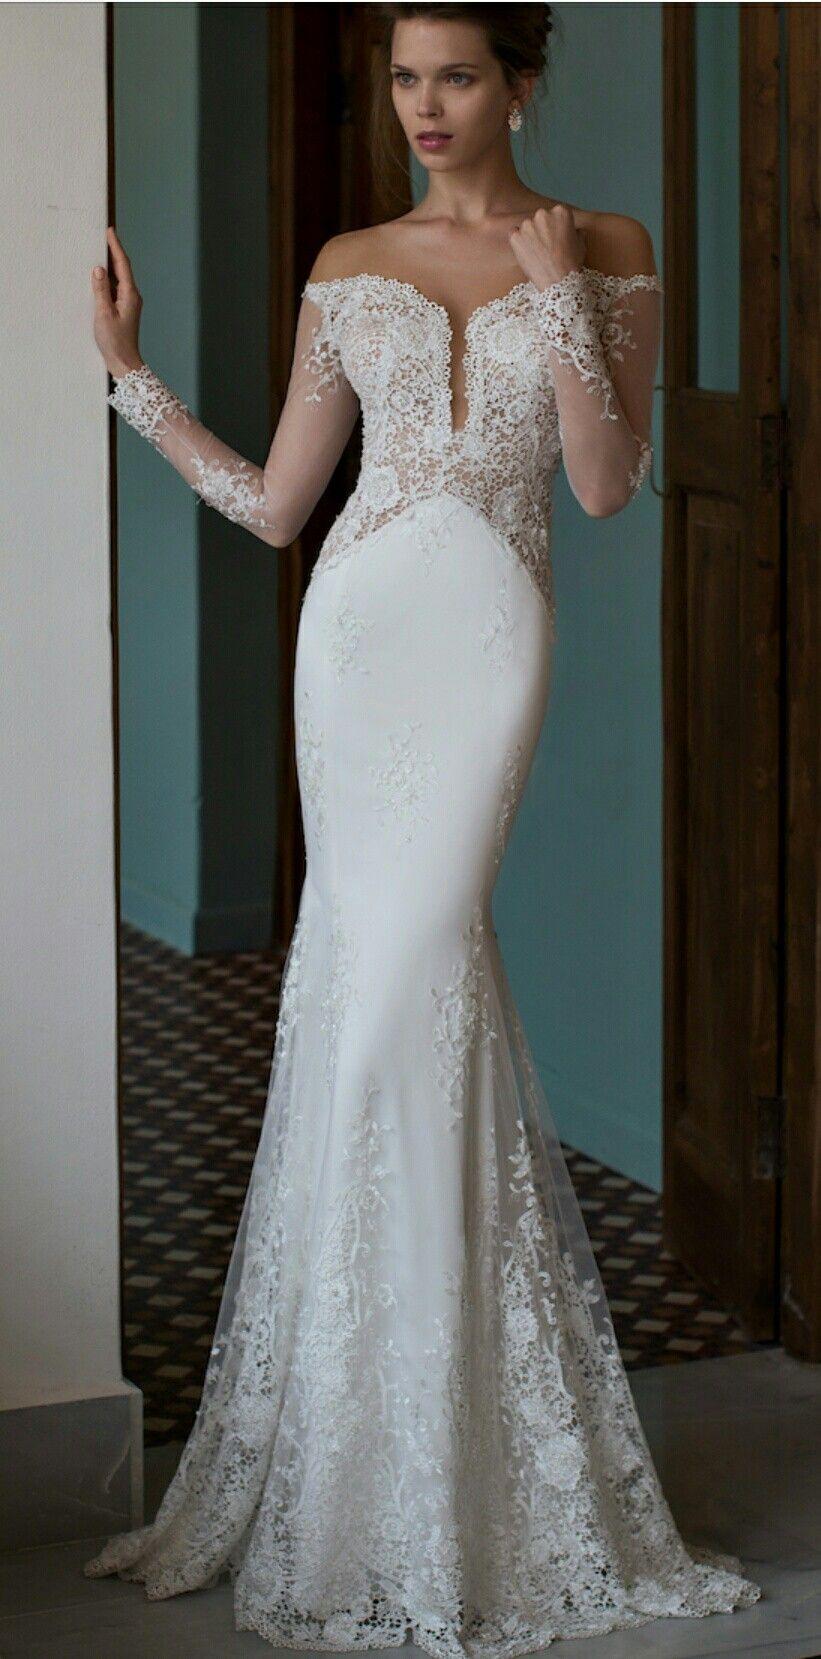 Riki dalal wedding gowns pinterest wedding dress weddings and